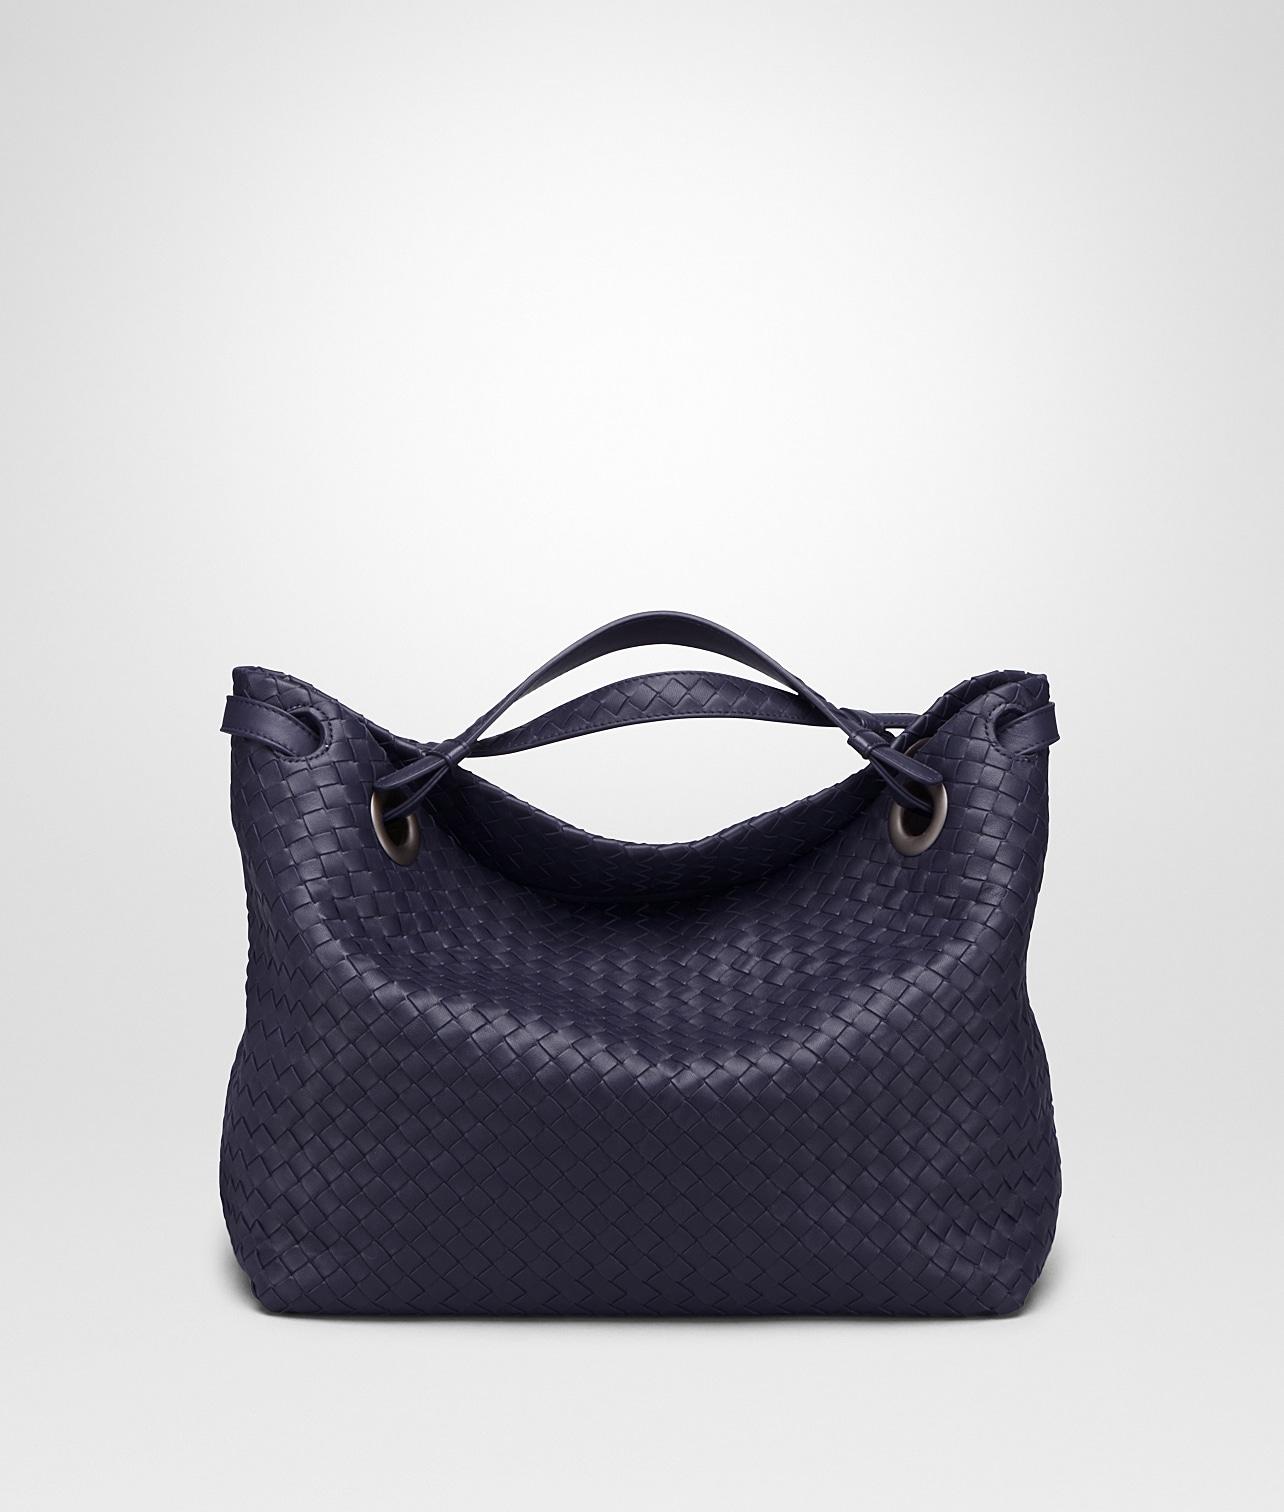 b89471d0e Bottega Veneta Bella Tote Bag Reference Guide | Spotted Fashion